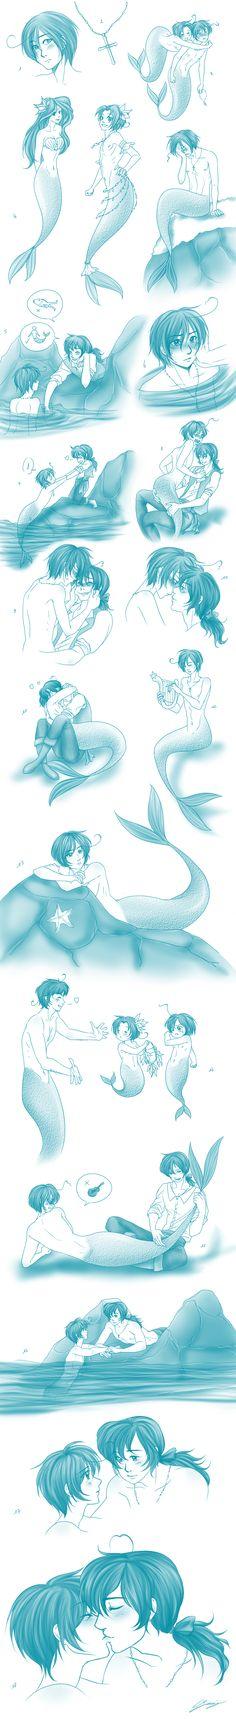 APH+-+Sketchdump+-+The+Little+Merman+3+by+x-Lilou-chan-x.deviantart.com+on+@deviantART